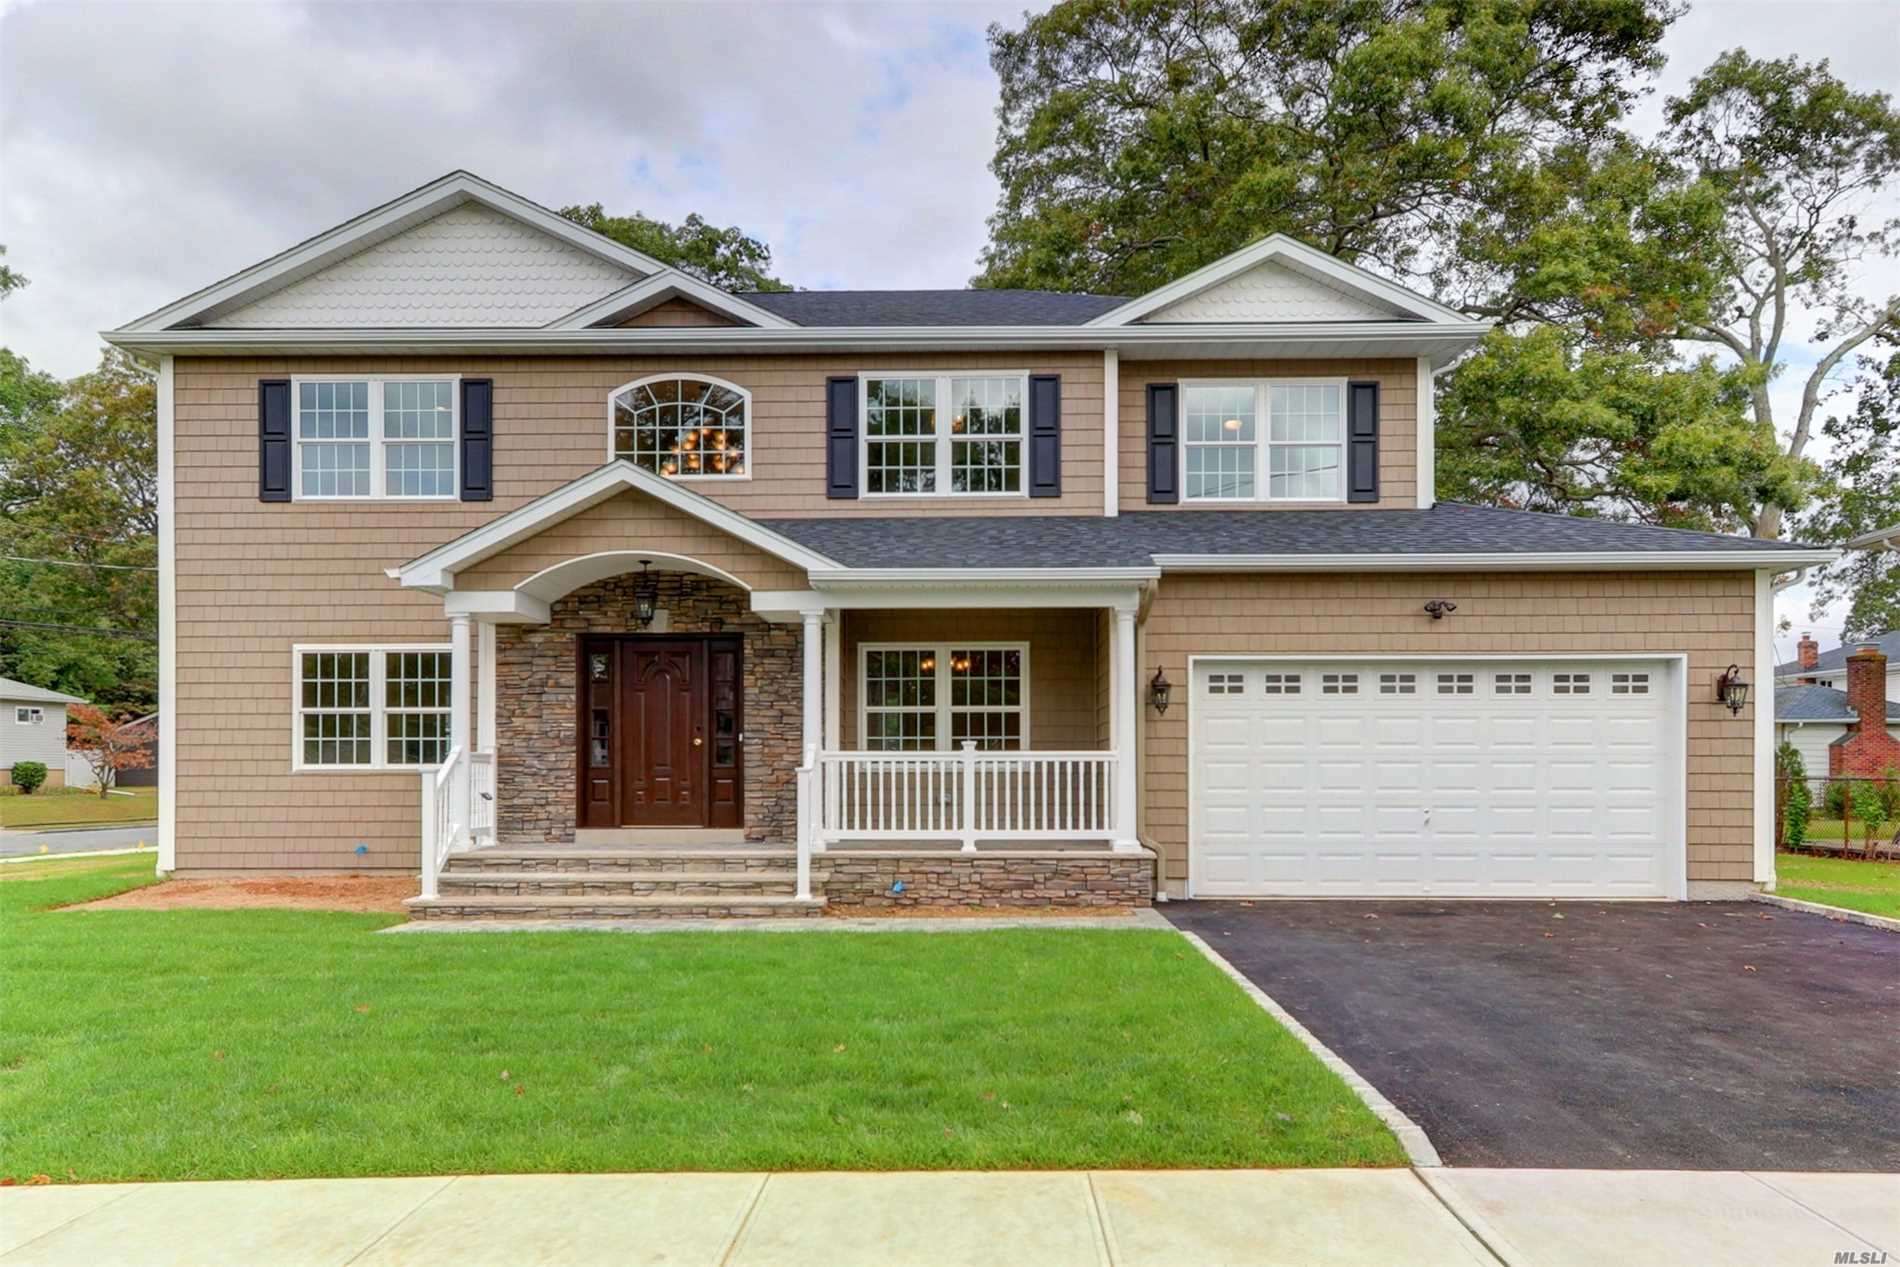 Photo of home for sale at 150 Grand Blvd, Massapequa Park NY